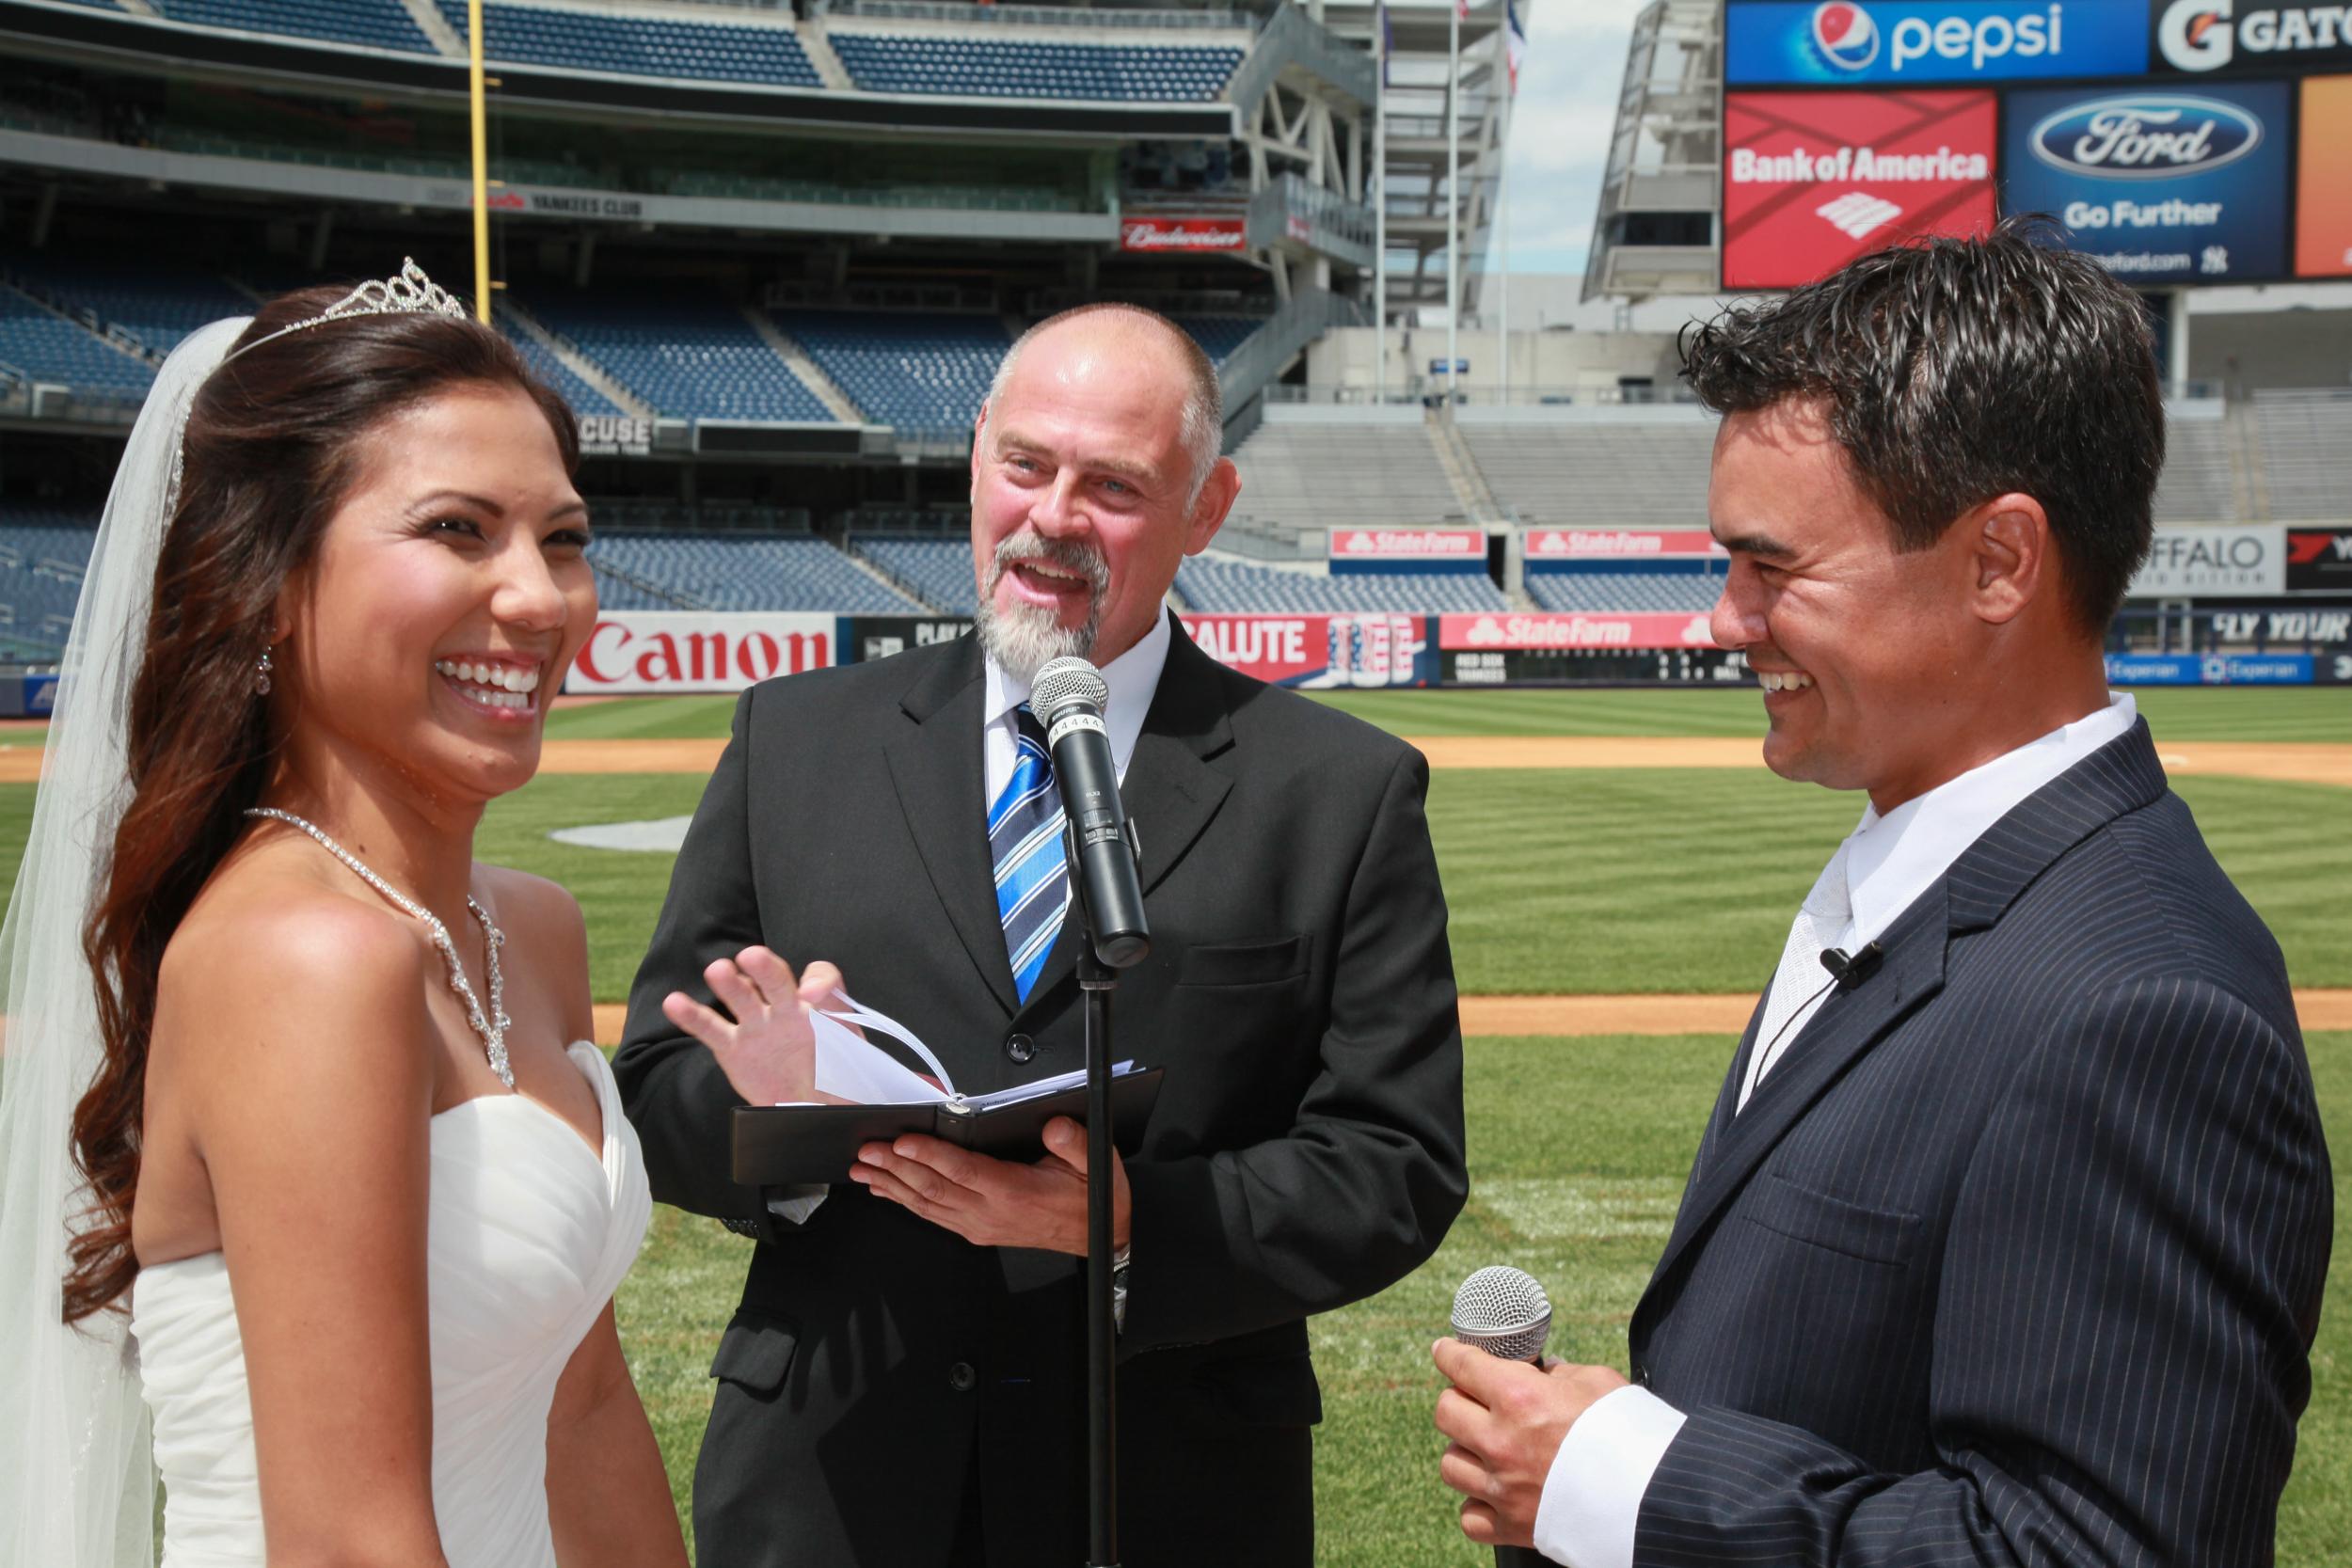 Wedding at Yankee Stadium